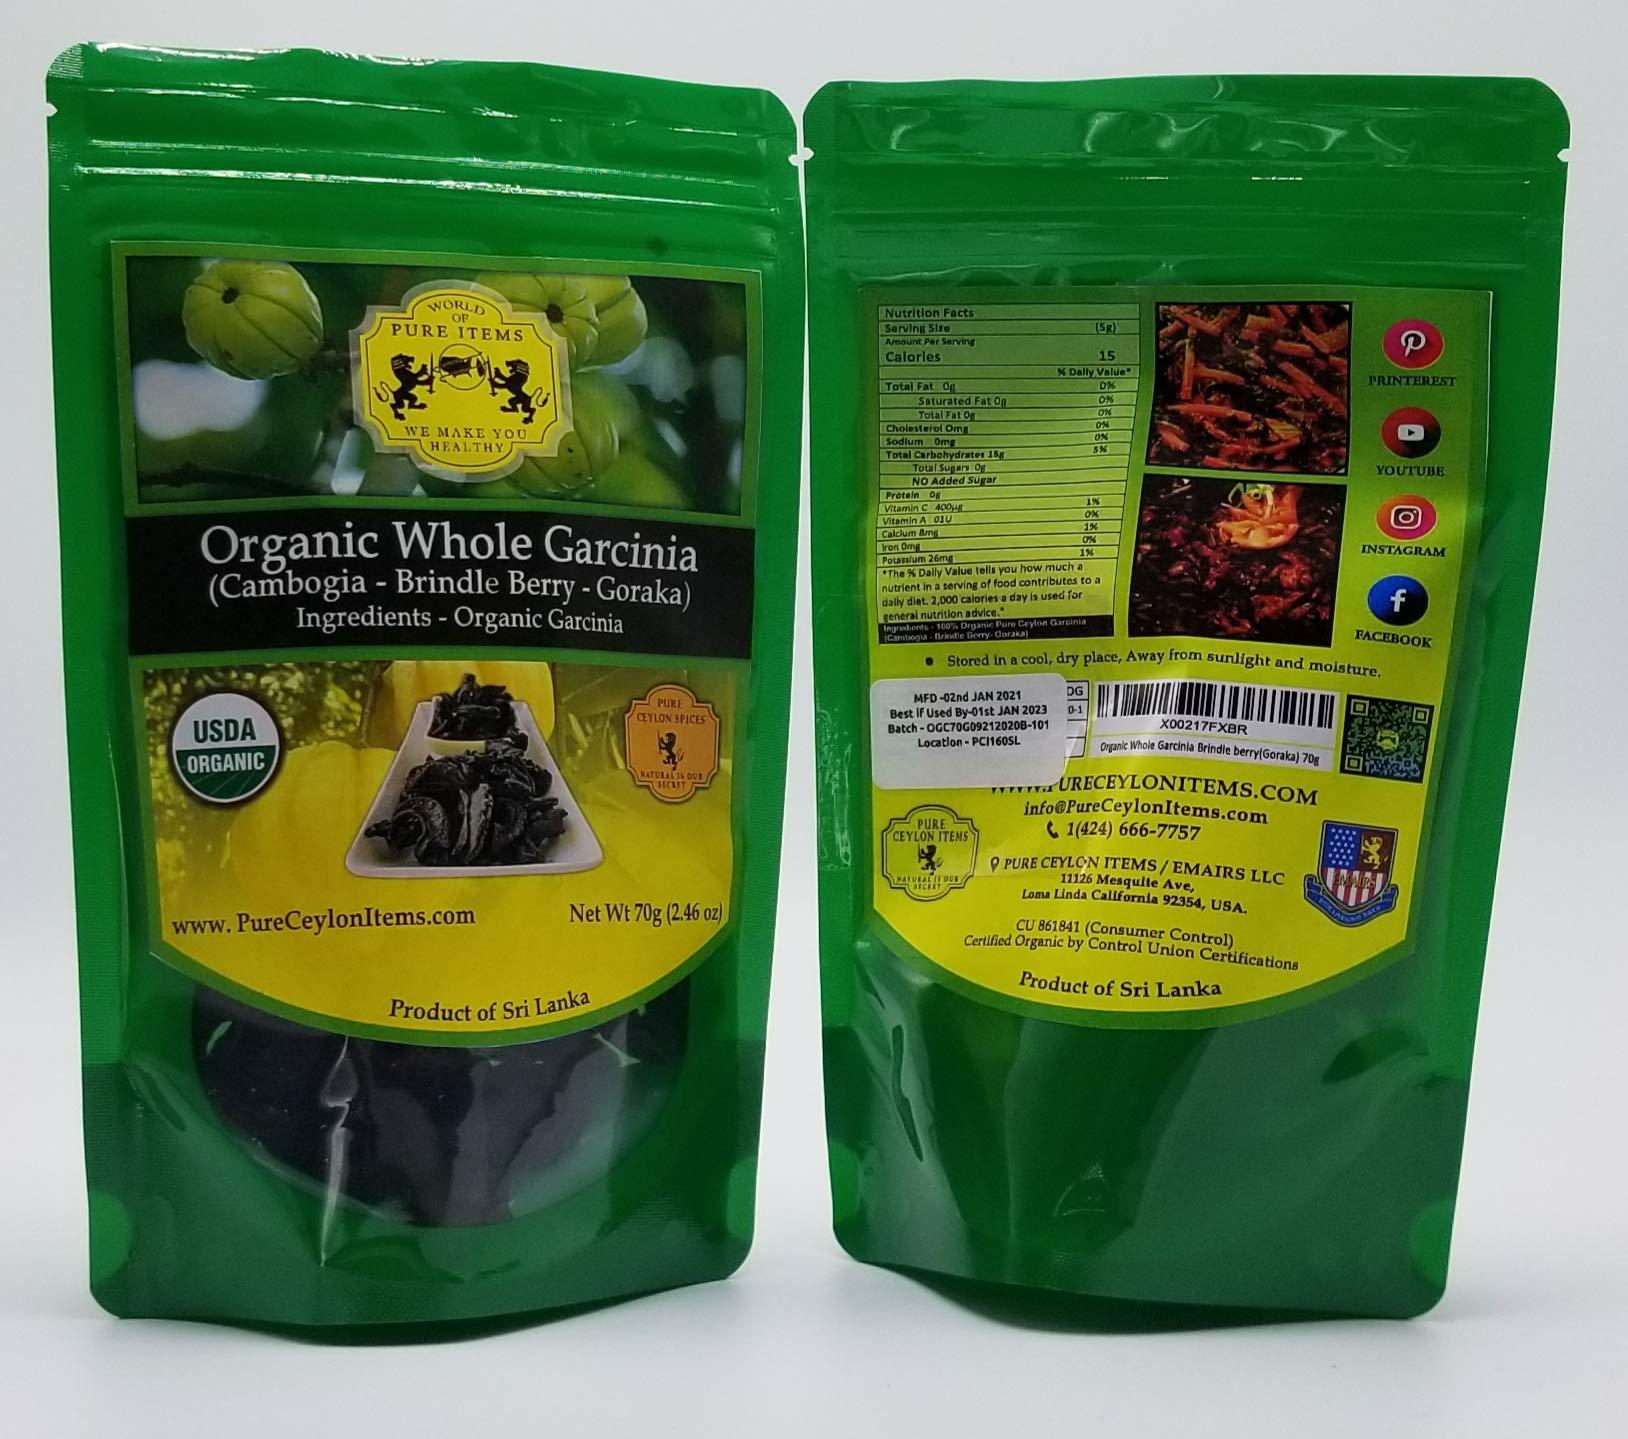 Organic Whole Garcinia Cambogia Brindle Berry (Goraka) 70g